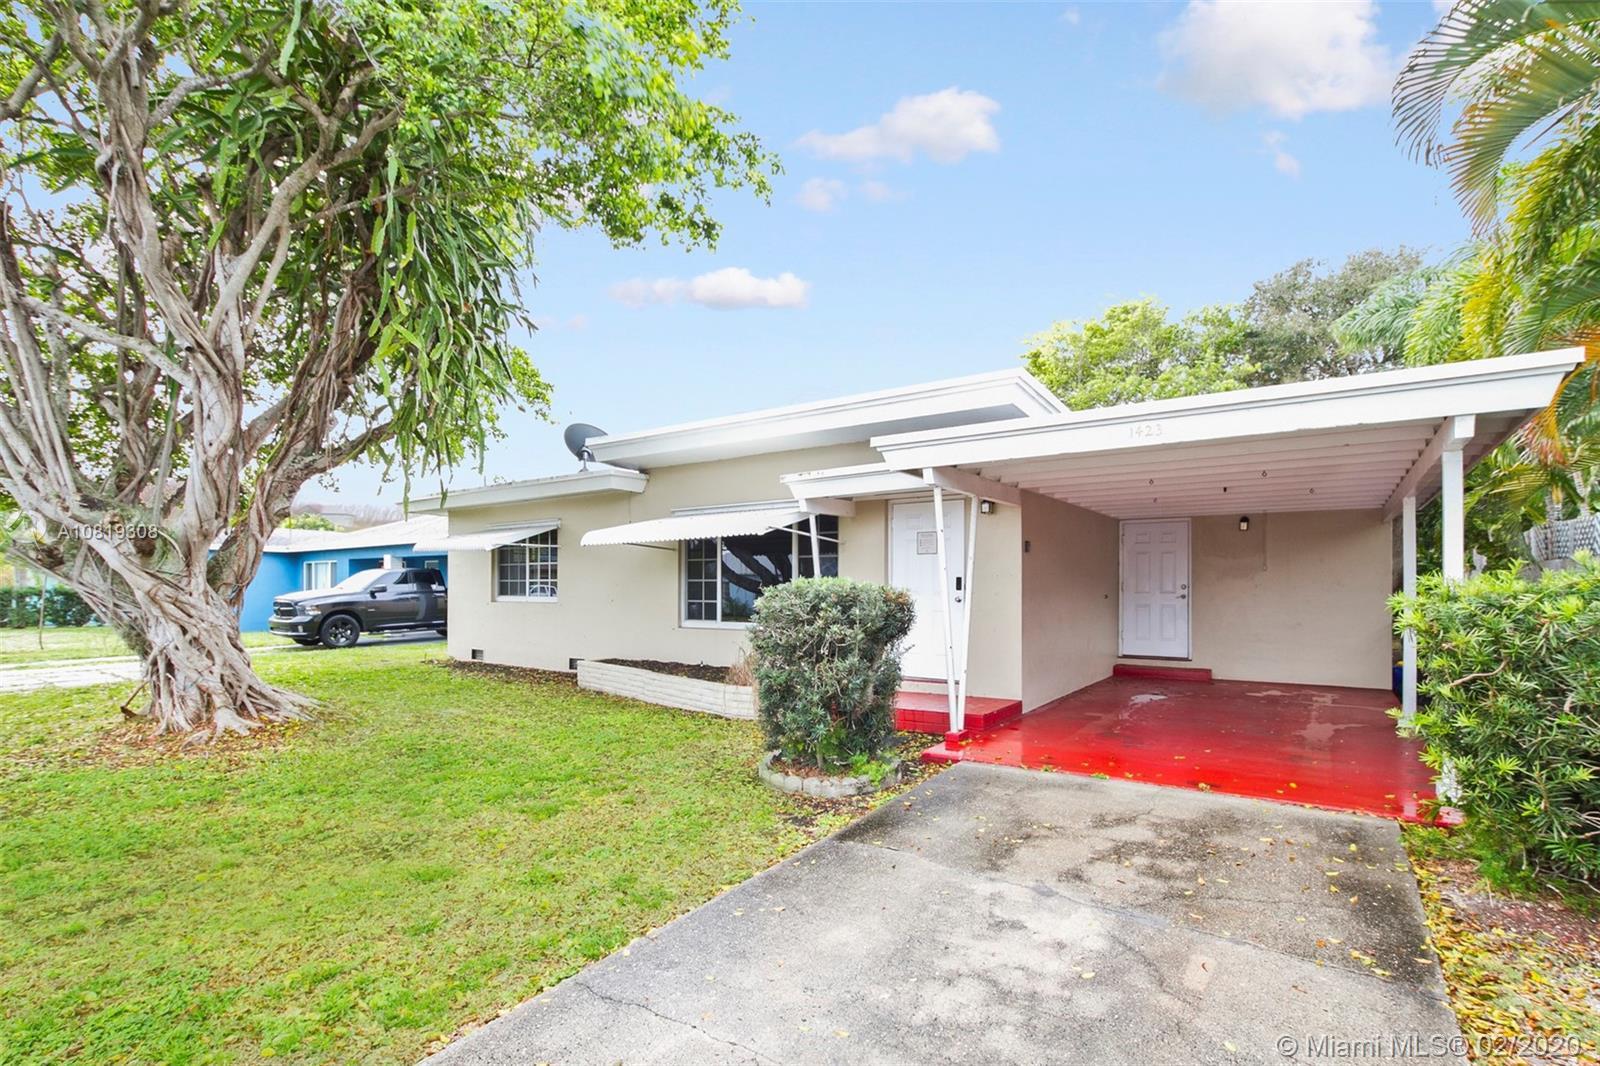 1423 N L St, Lake Worth, FL 33460